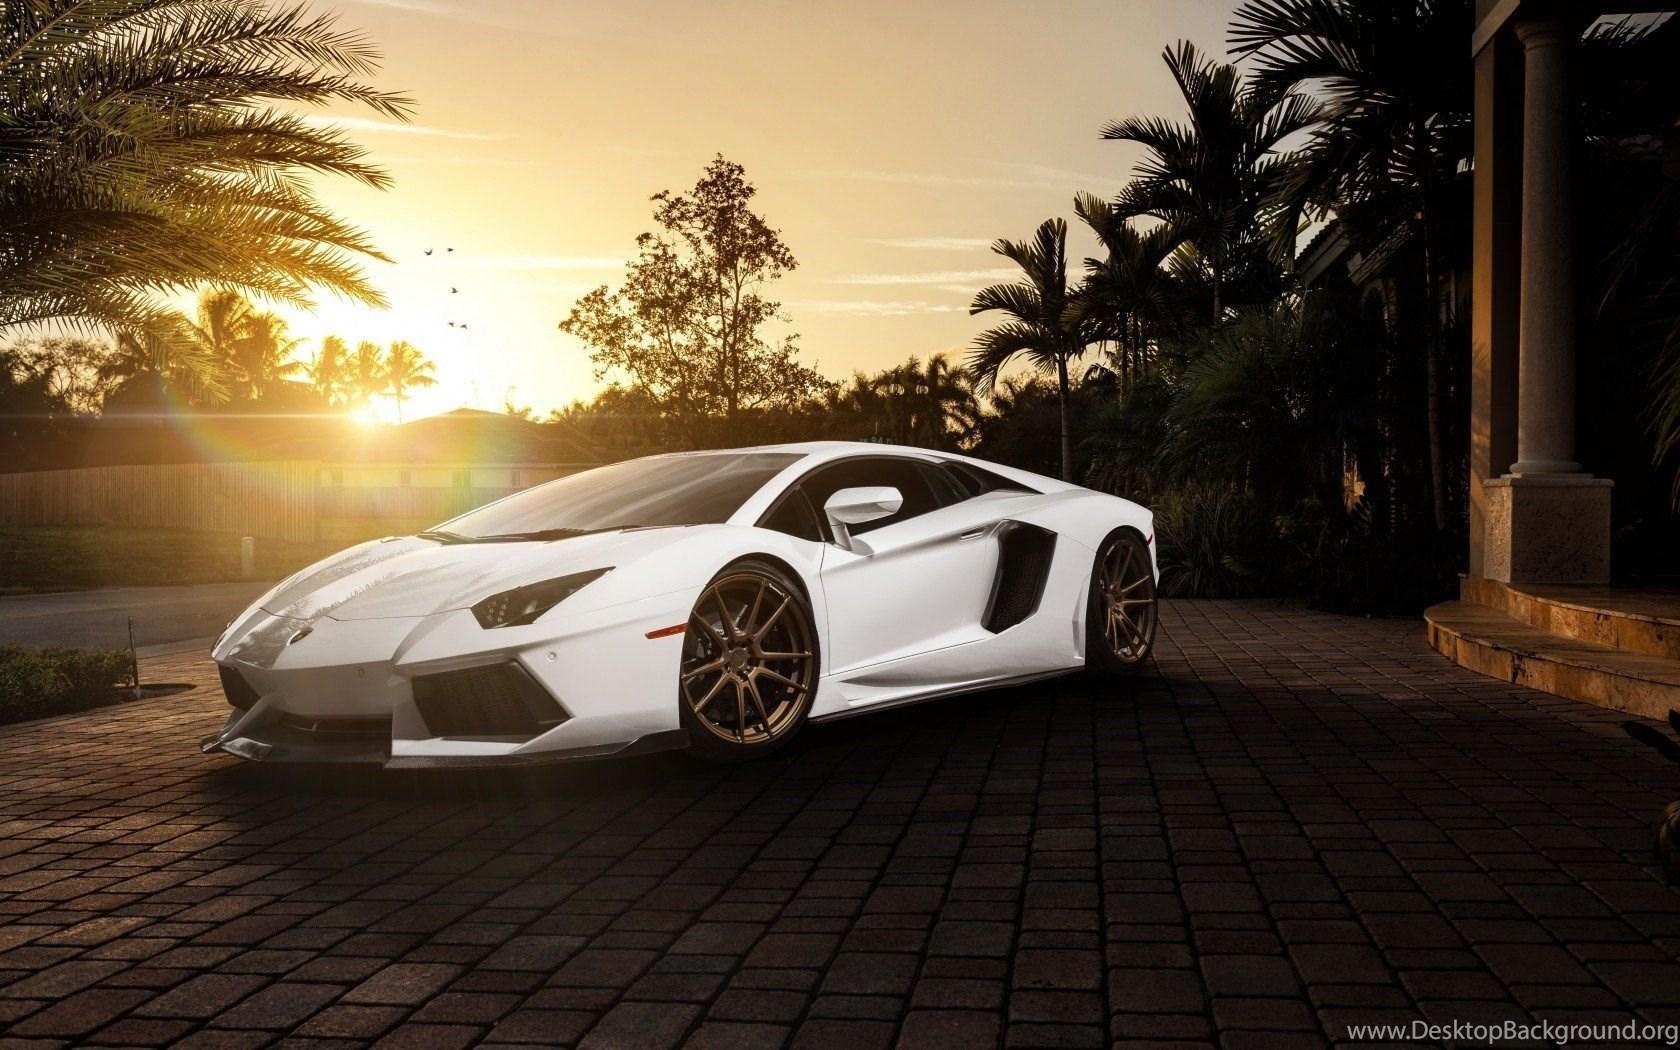 Lamborghini Wallpapers Hd Free To Dowload Desktop Background